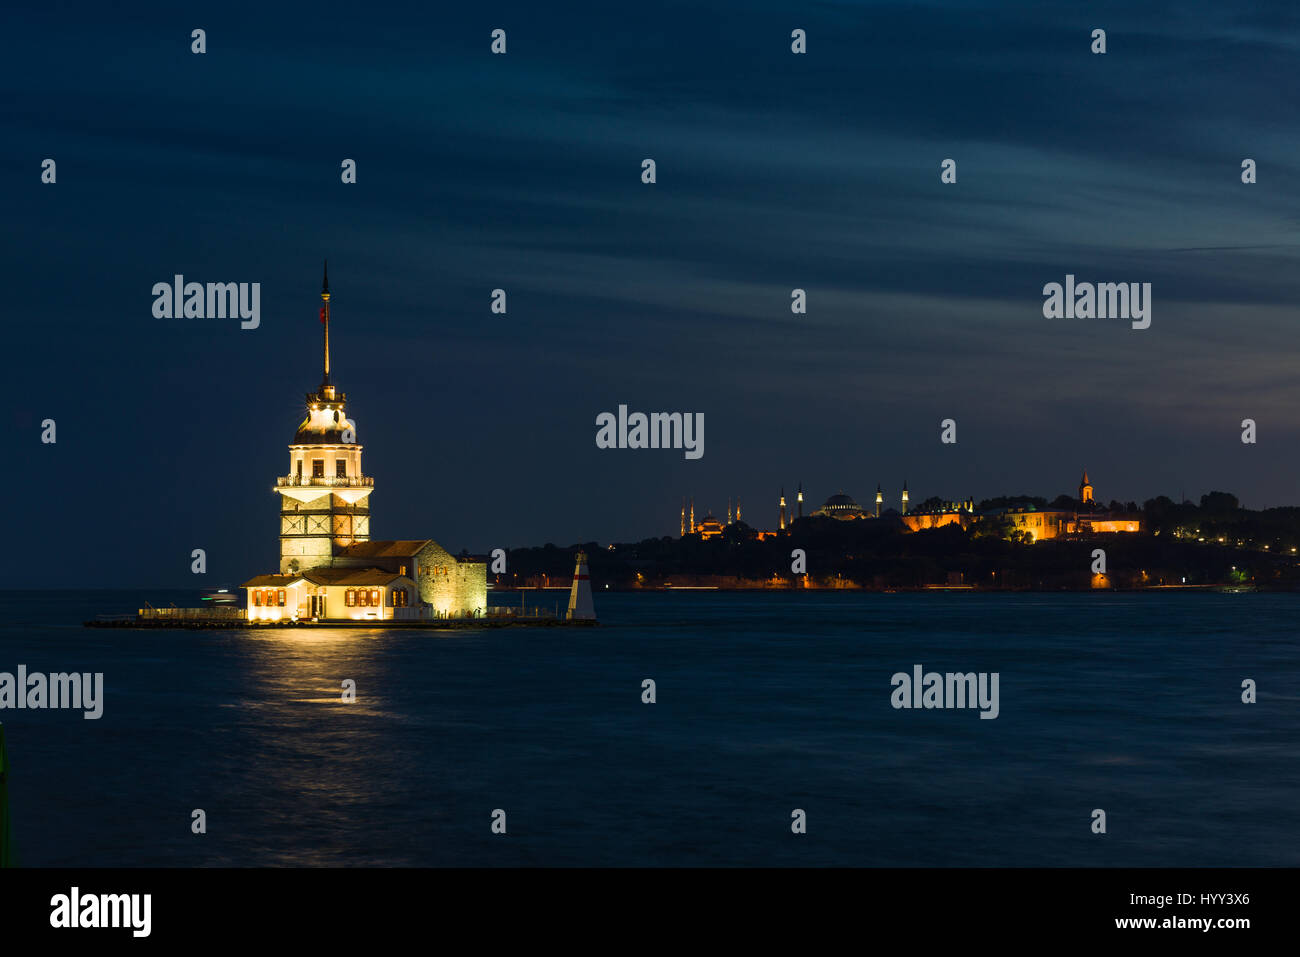 Maidens Tower (Kiz Kulesi) and Golden Horn lit up in evening light, Istanbul - Stock Image